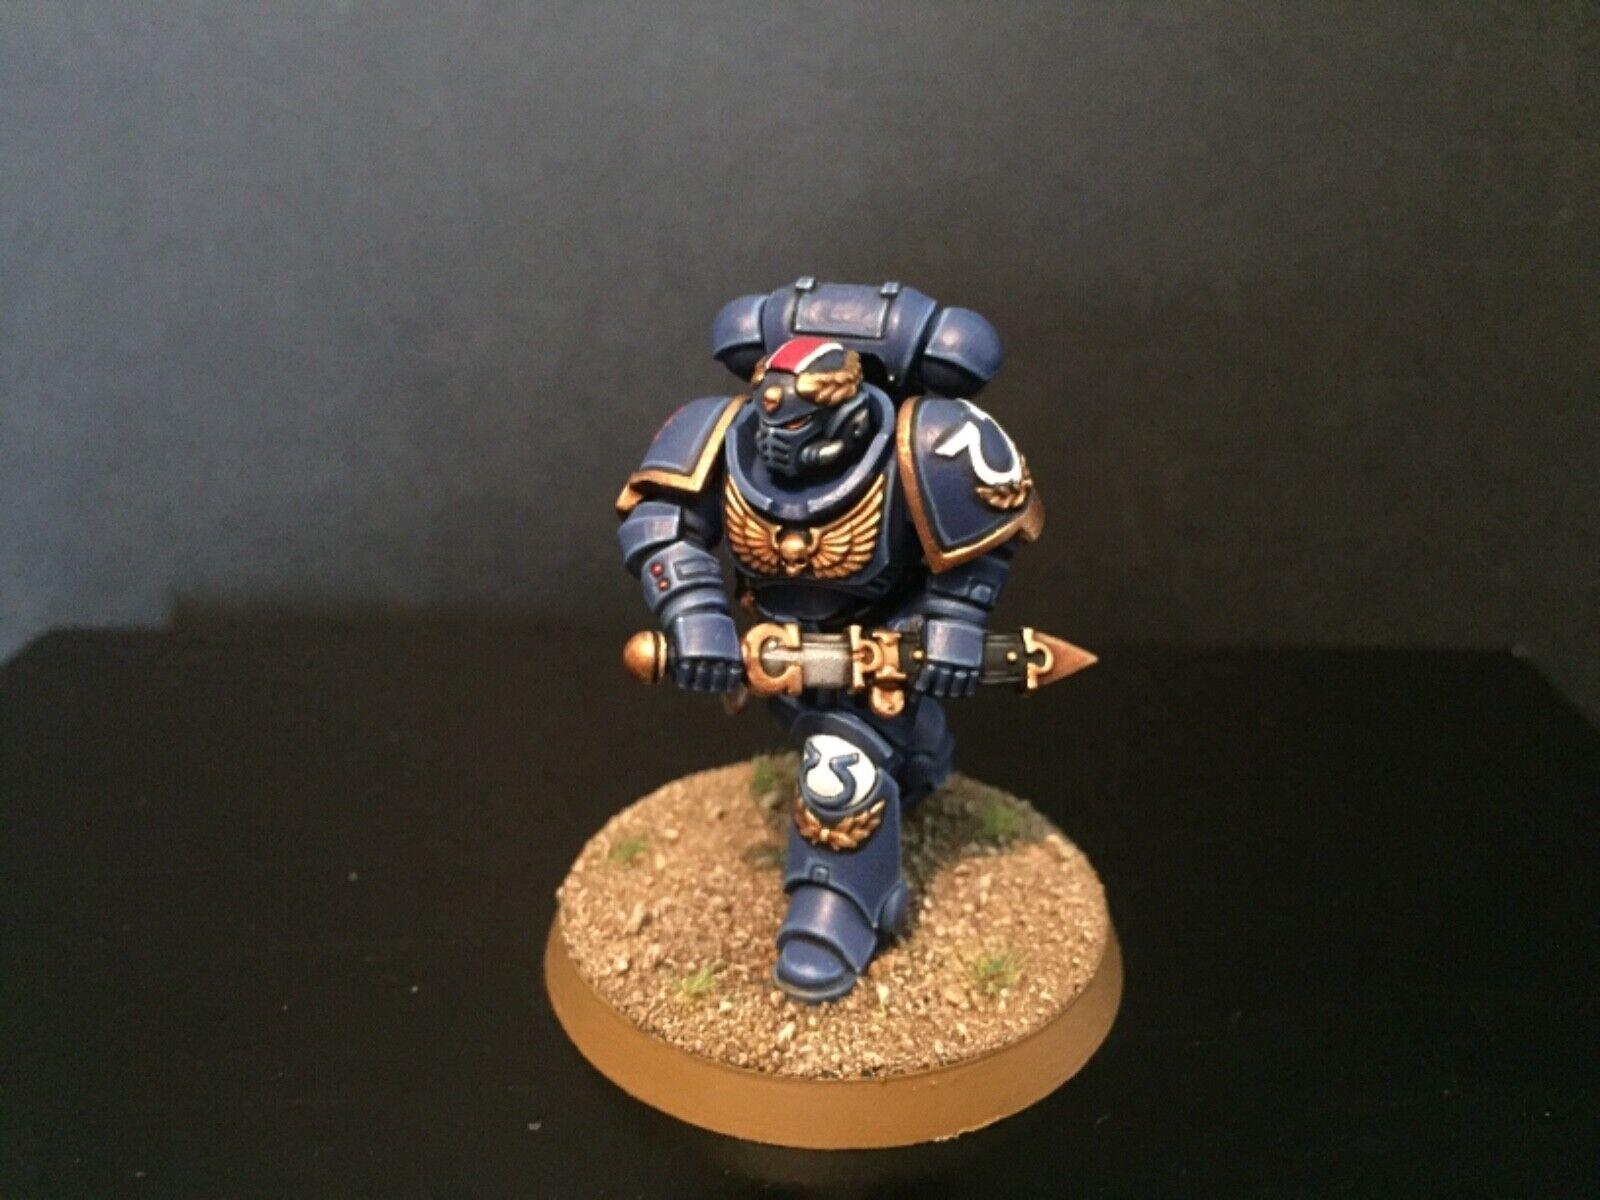 Warhammer 40k Conquest Lieutenant Calsius Well Painted GW Primaris Space Marine